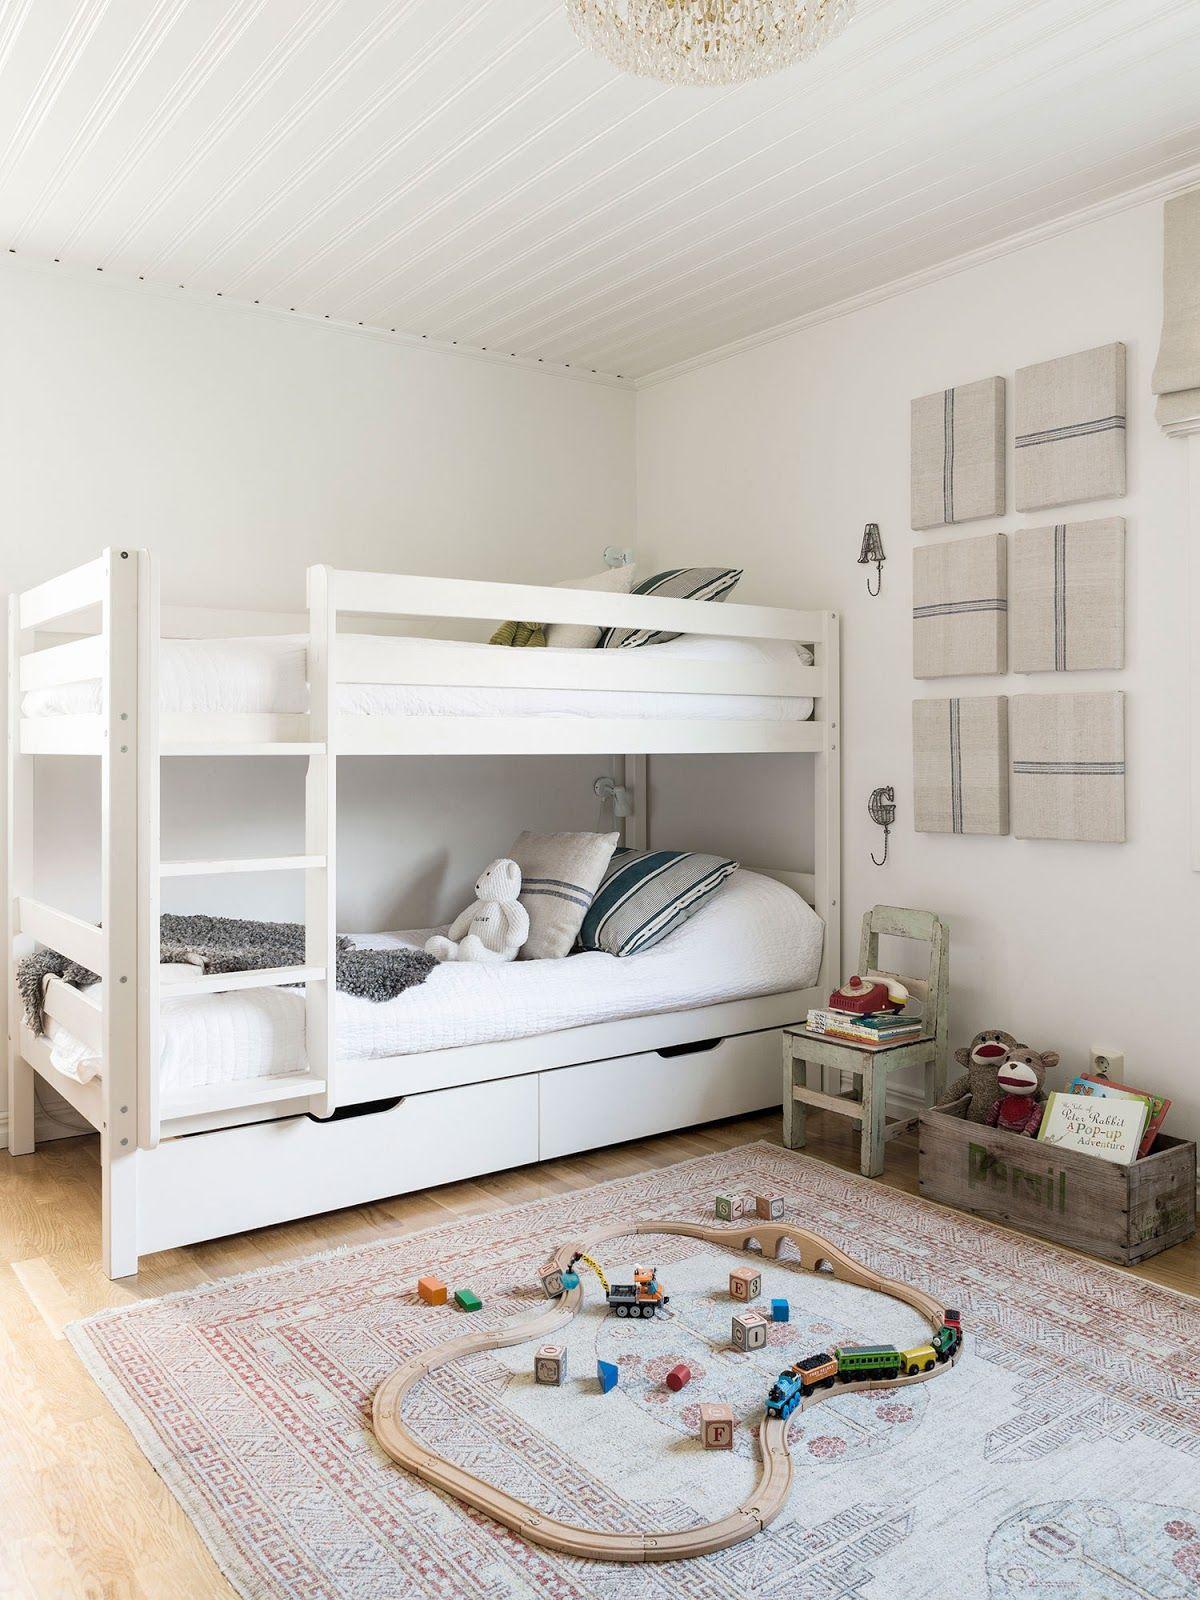 Dormitorio Infantil doble de estilo vintage